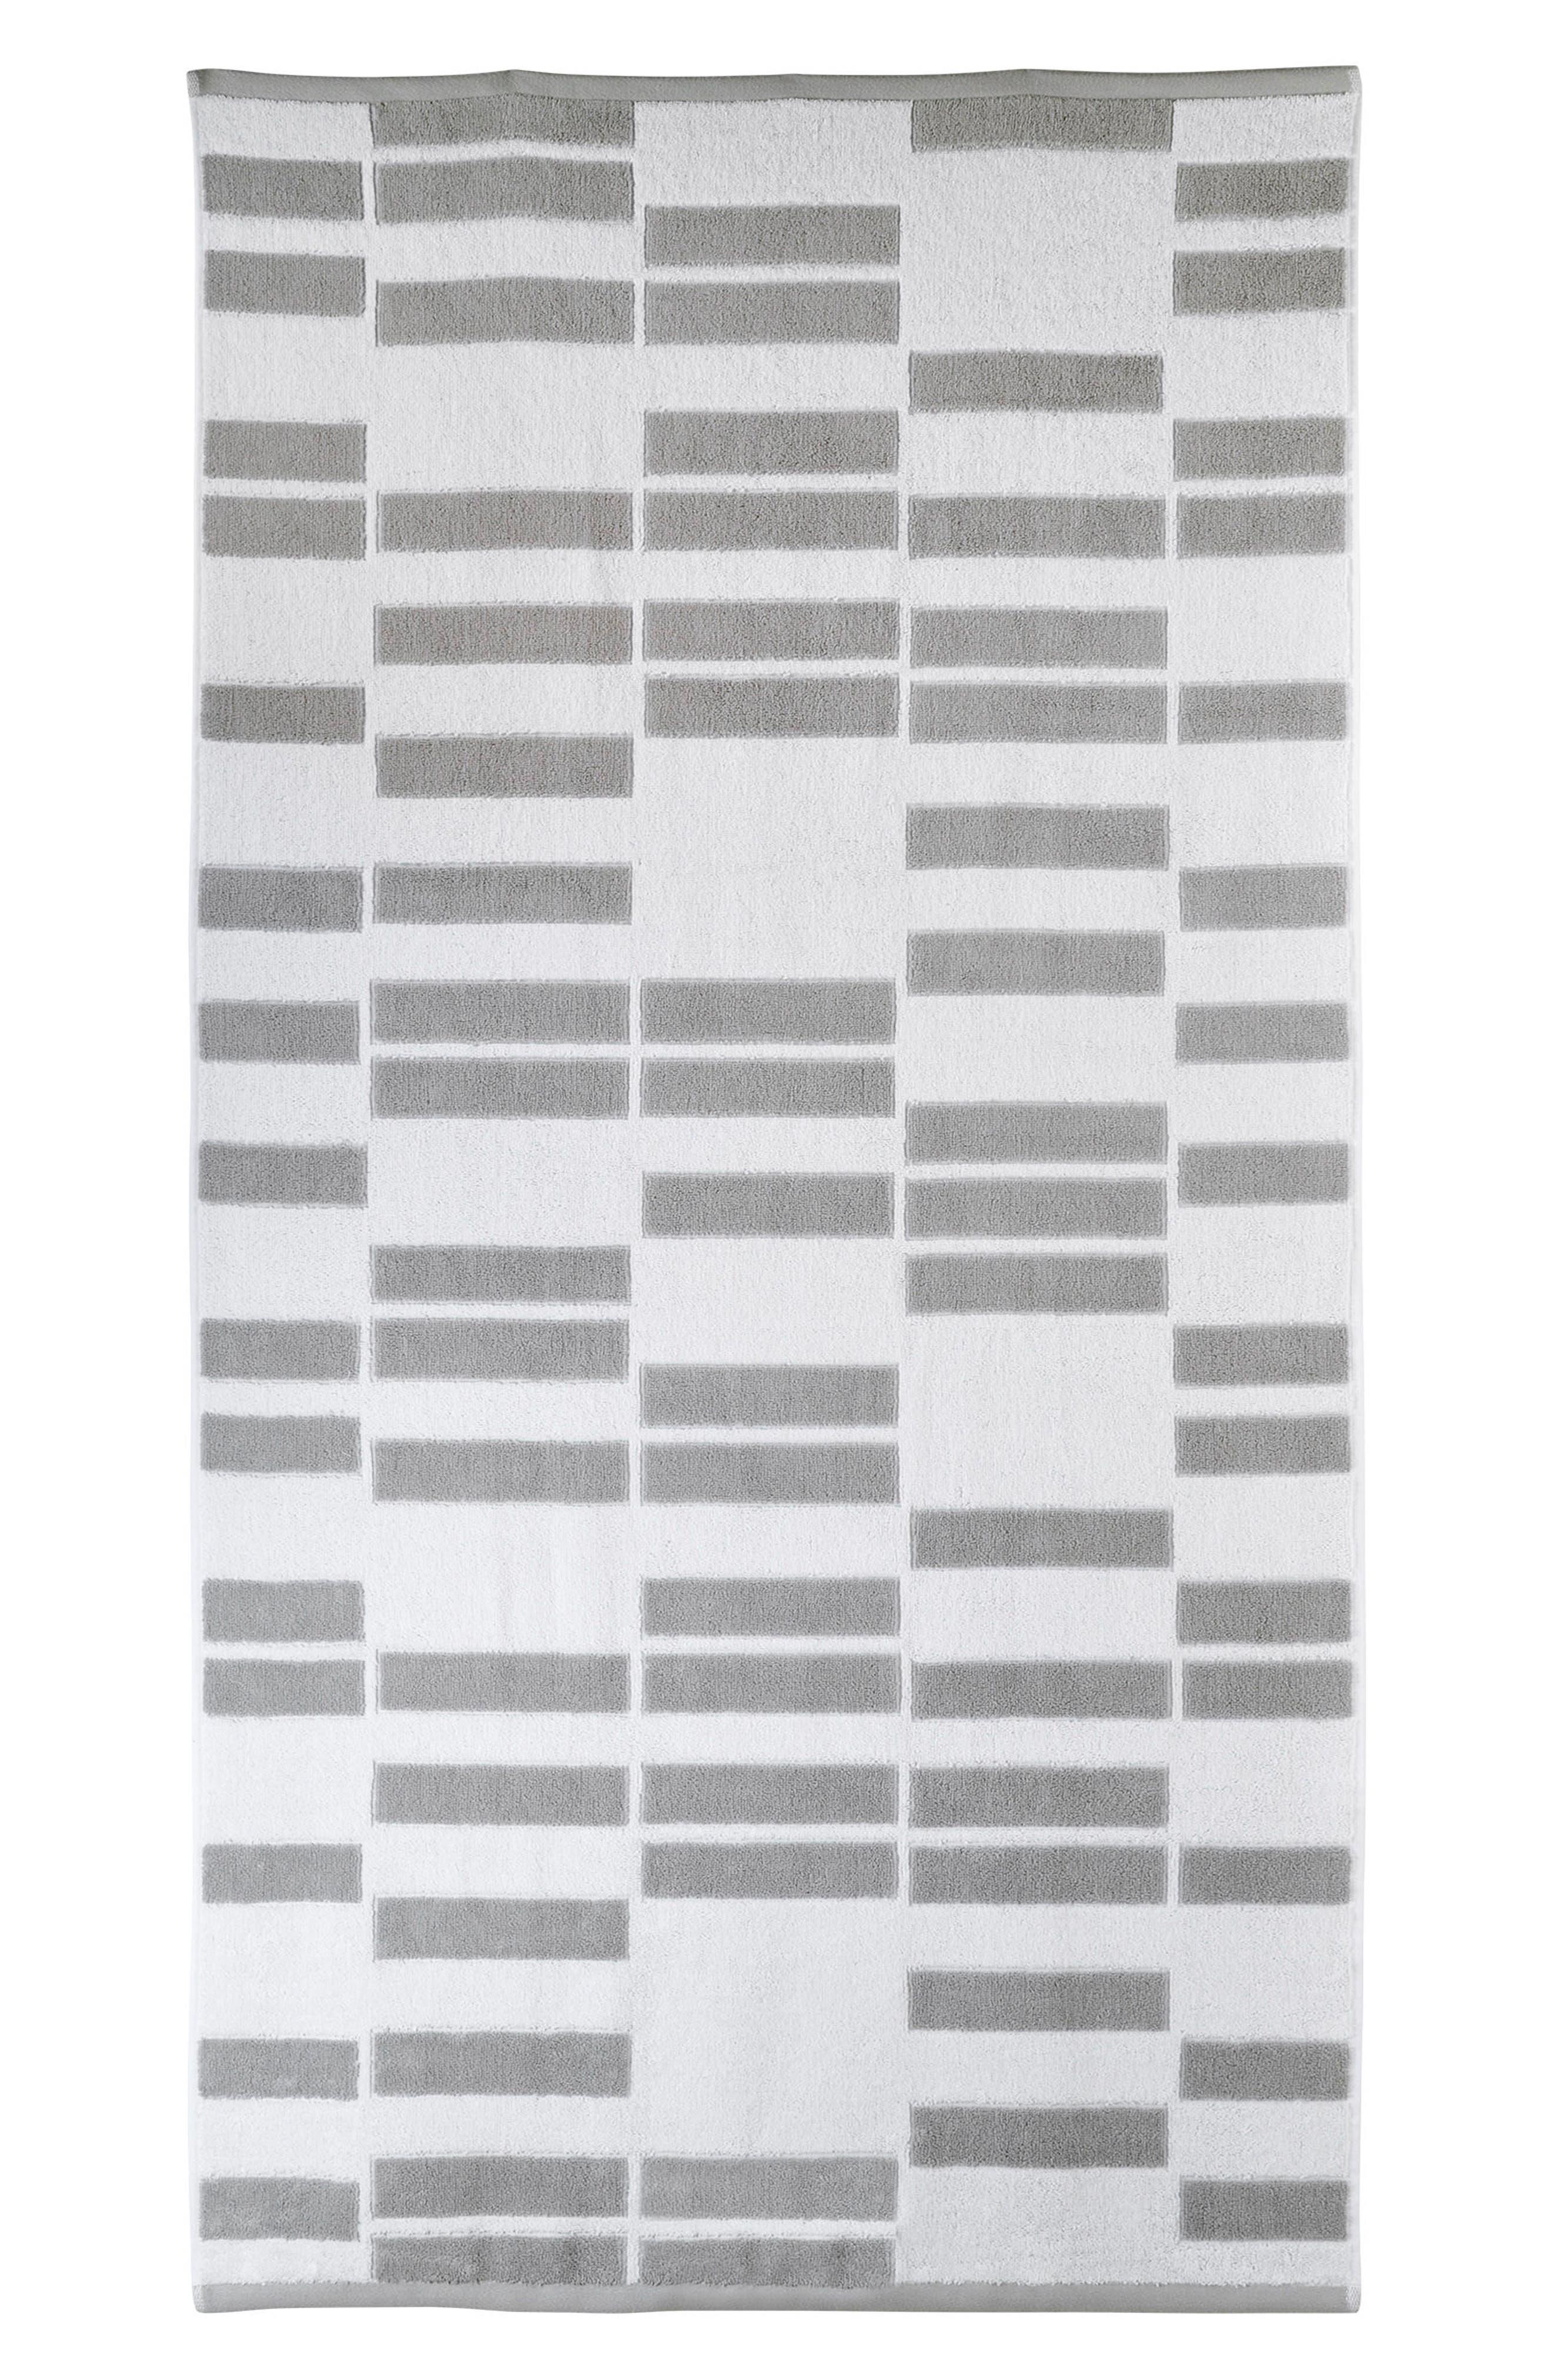 DKNY High Rise Bath Towel